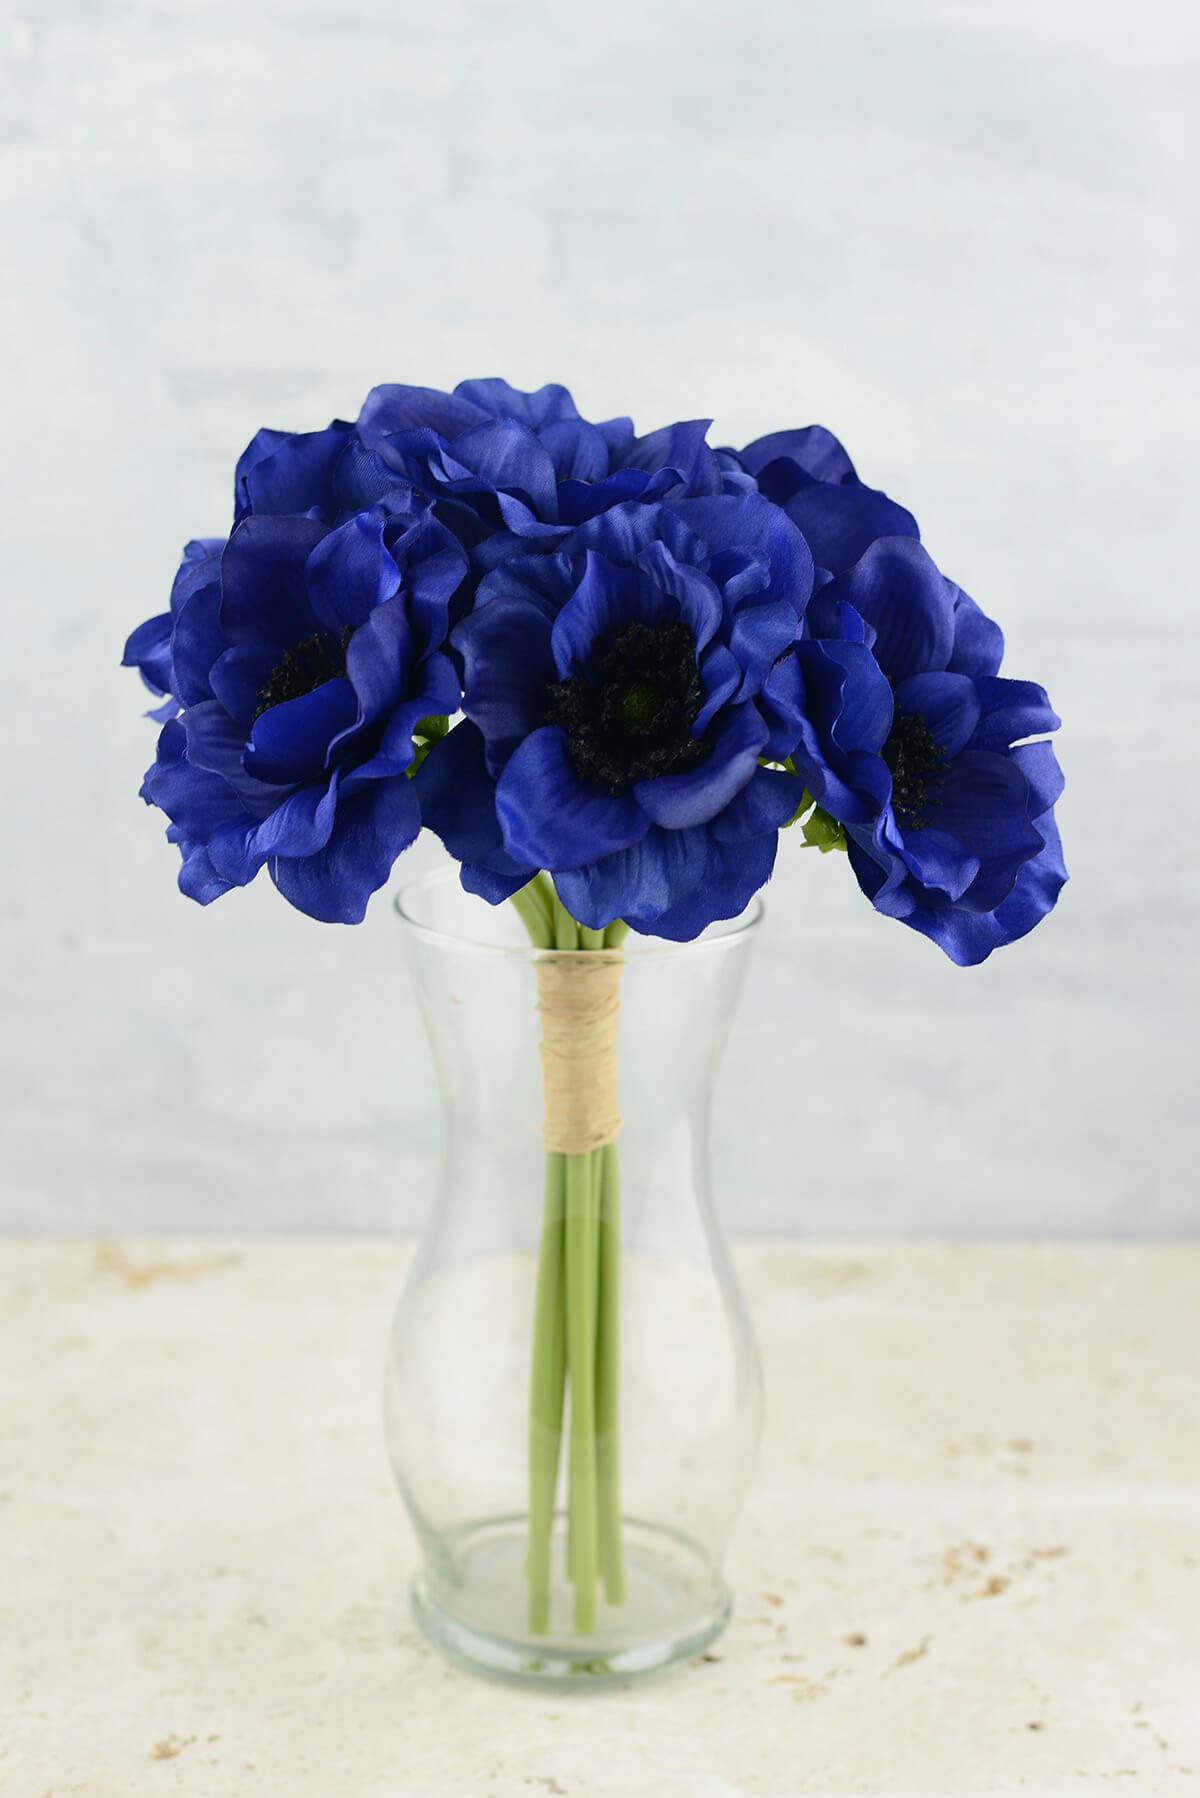 anemone faux flower bundle in navy blue